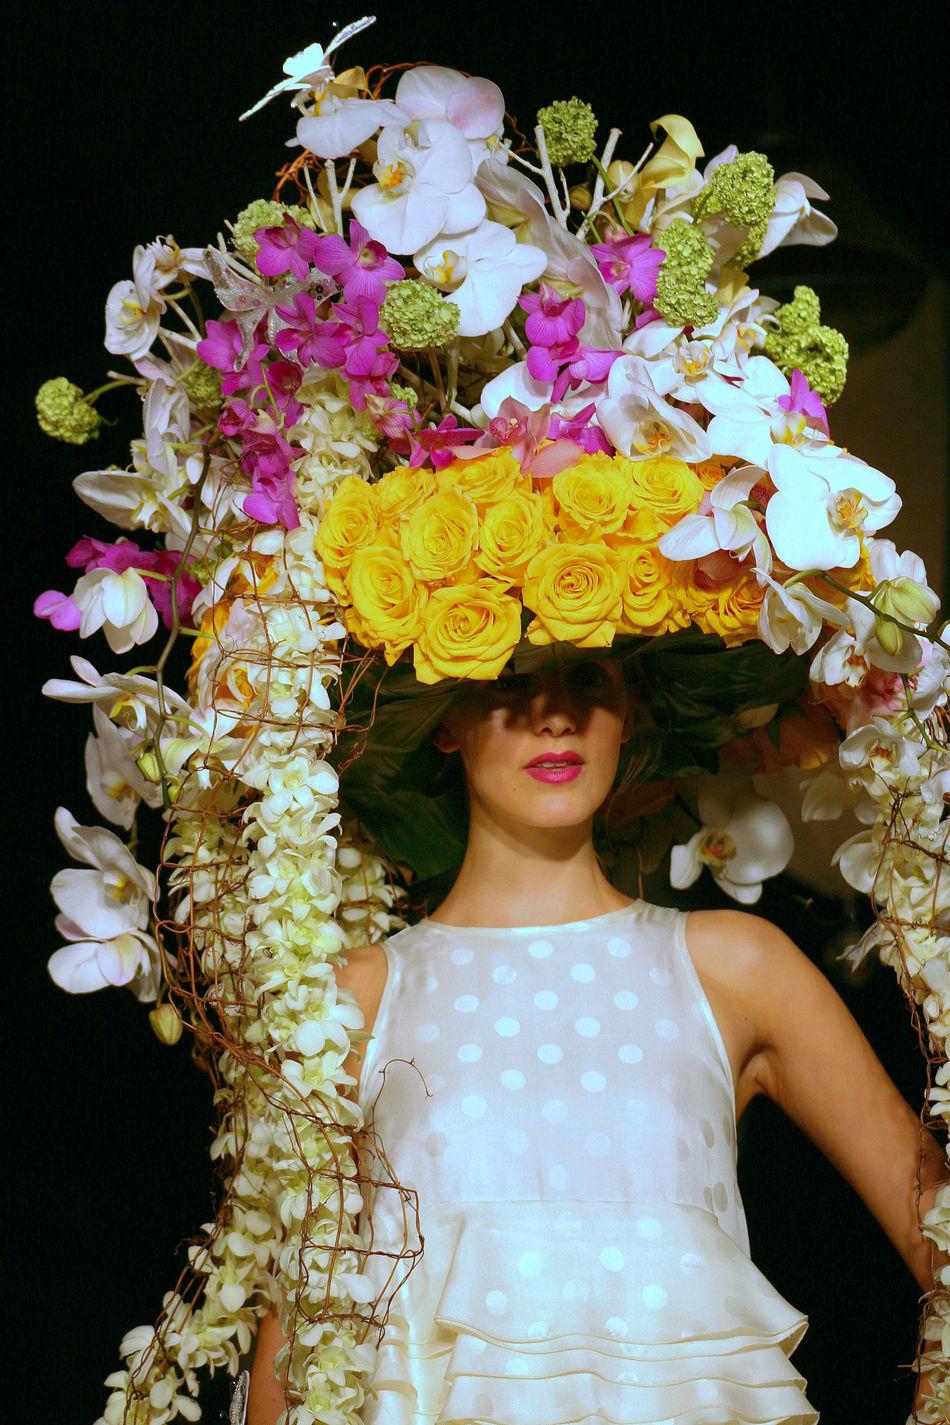 Bouquet Flower Front View Hat Hat Fashion Hat Flowers Model Modeling Portrait Runway Model Runwayfashion